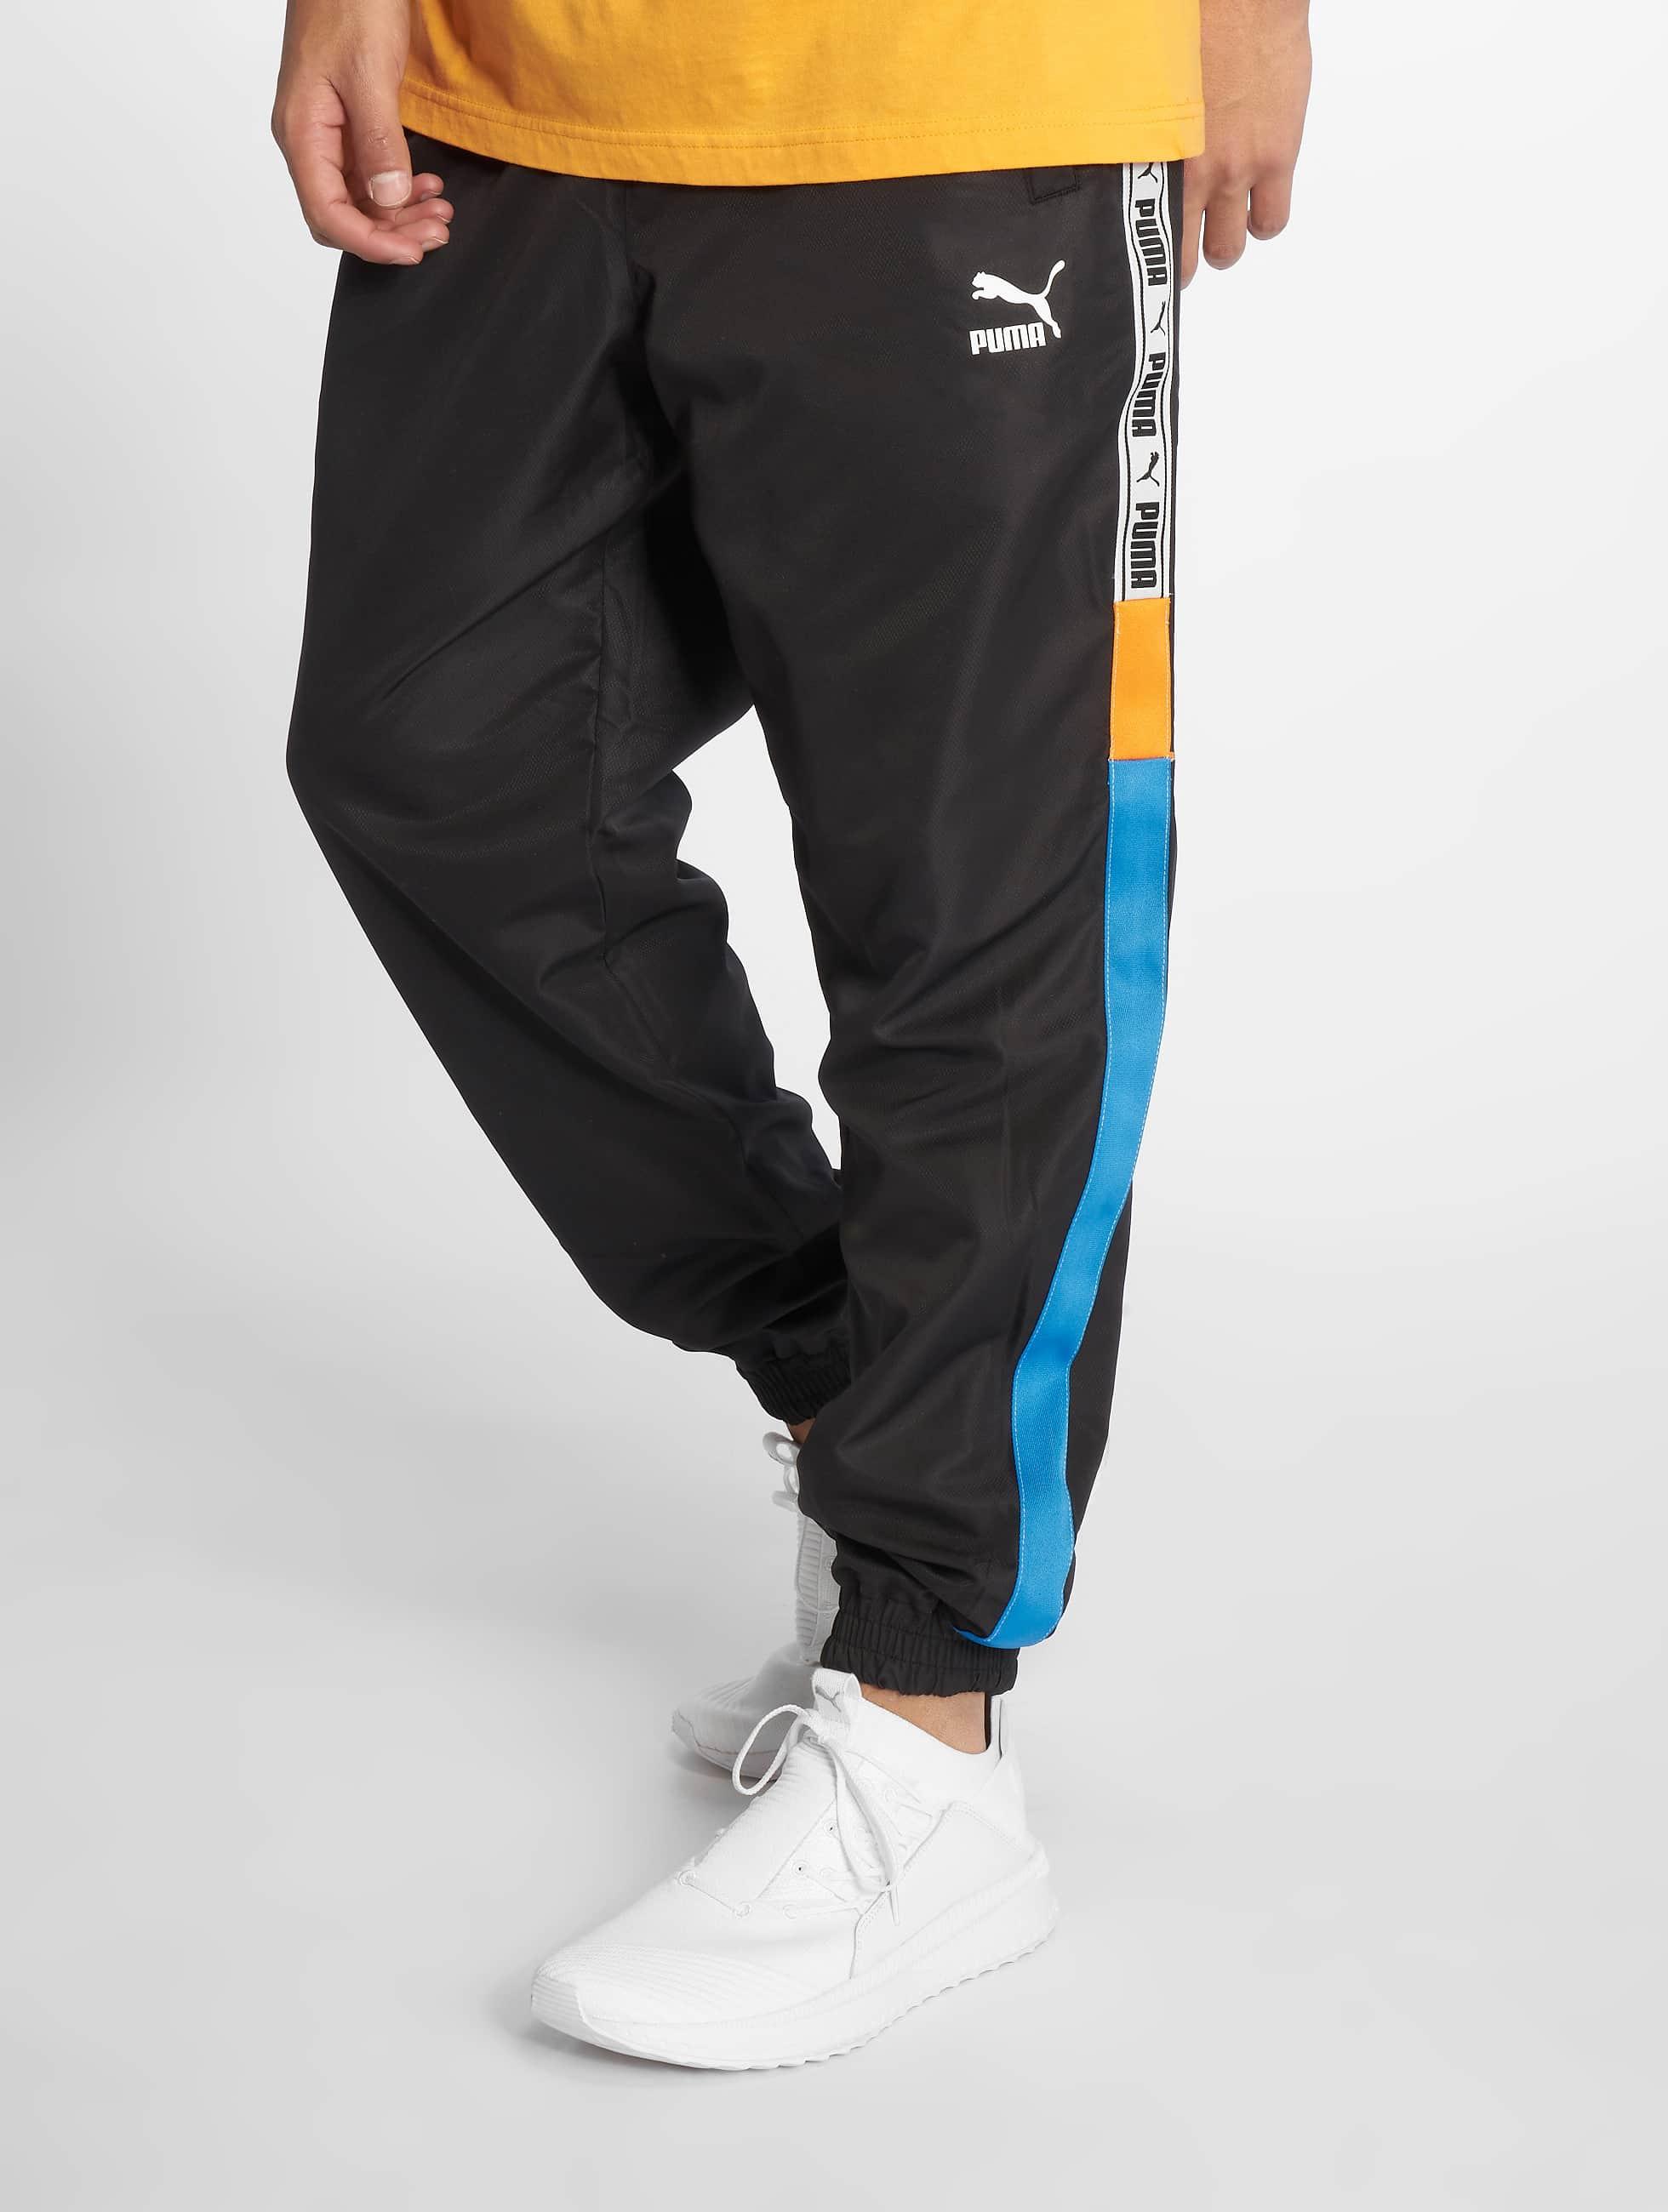 Clothing, Shoes & Accessories Jogginghose Herren Puma S